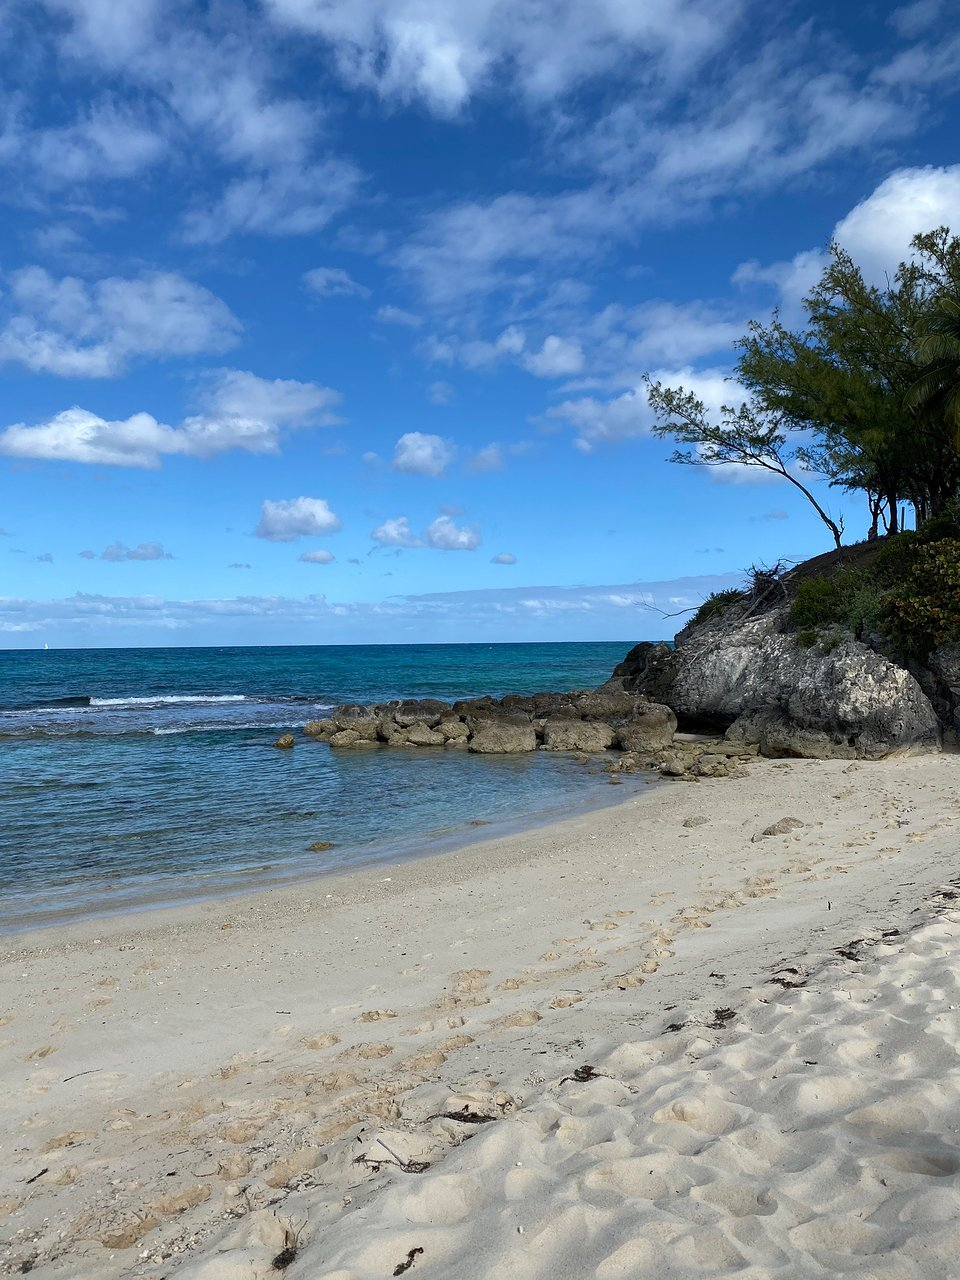 Blue Lagoon Island Nassau 2020 All You Need To Know